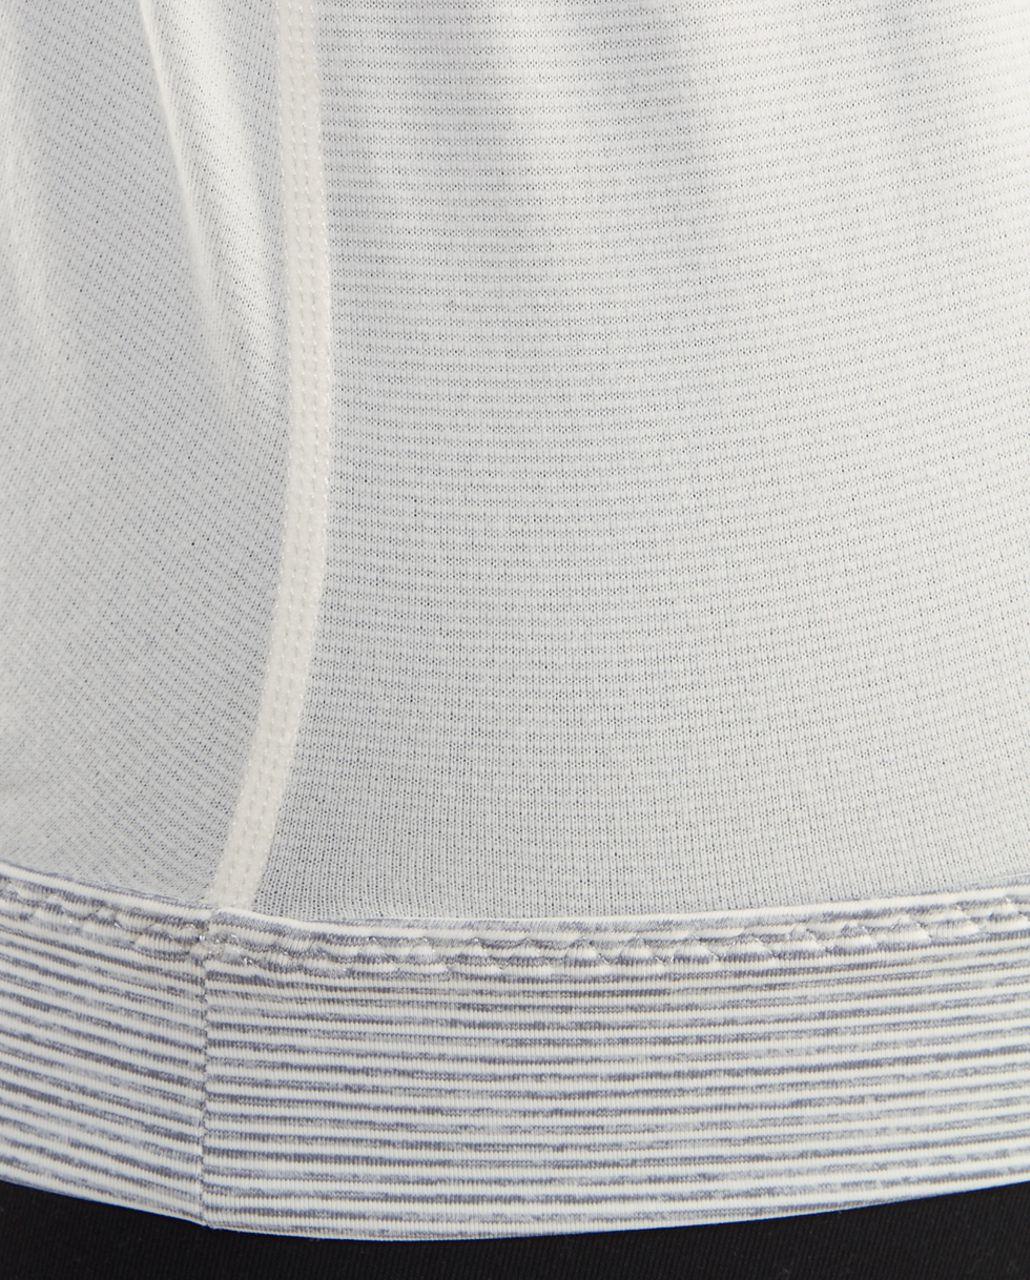 Lululemon Pure Focus Tank - Ghost /  Ghost Blurred Grey Mini Stripe